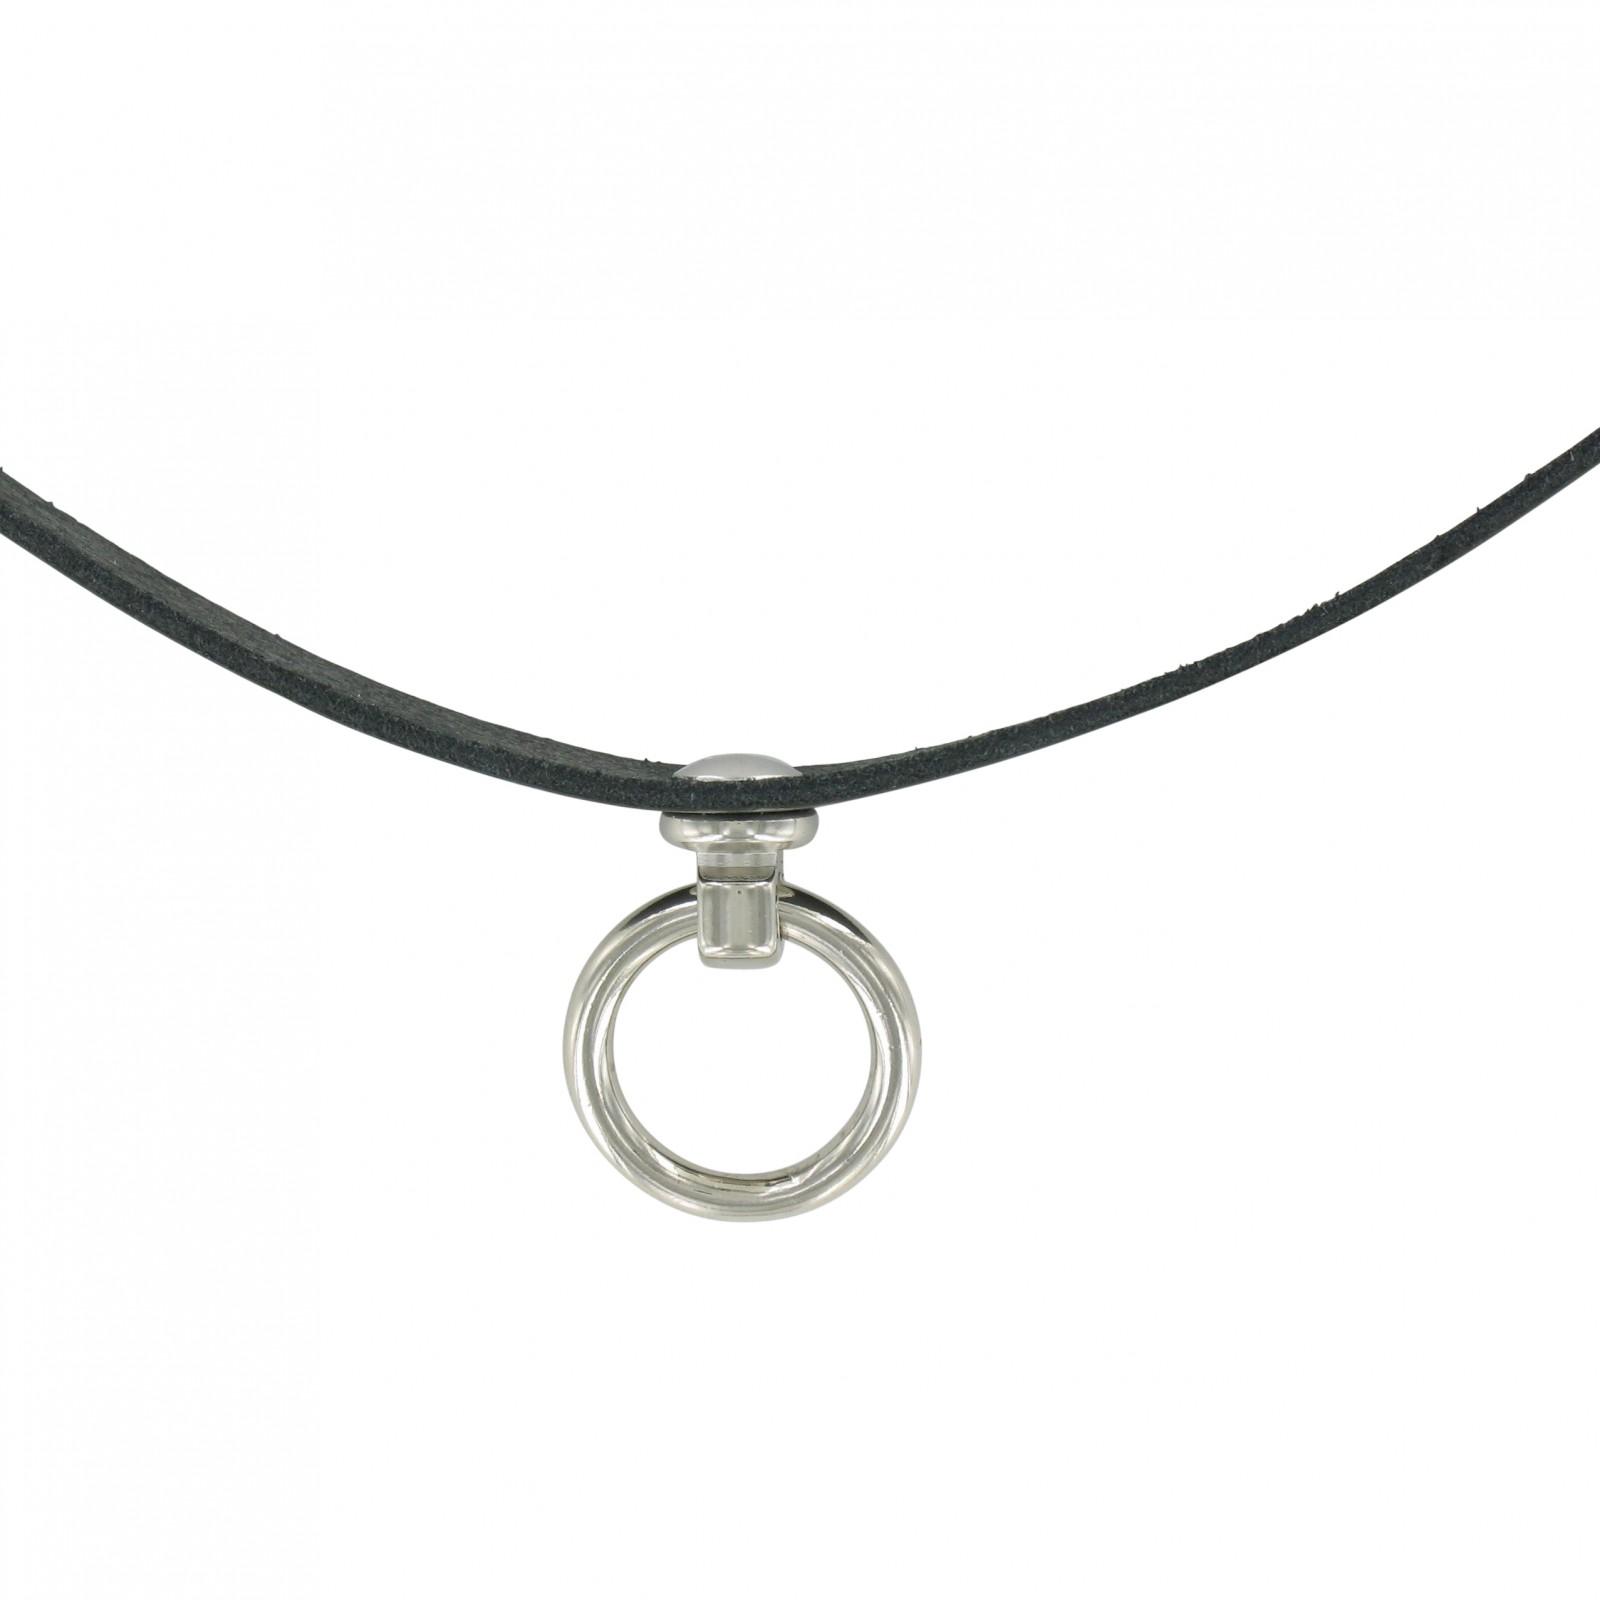 SiaLinda Halsband O Ring Echt Leder schwarz Choker Gothik BDSM  Geschenkkarton  8bebdd4255224